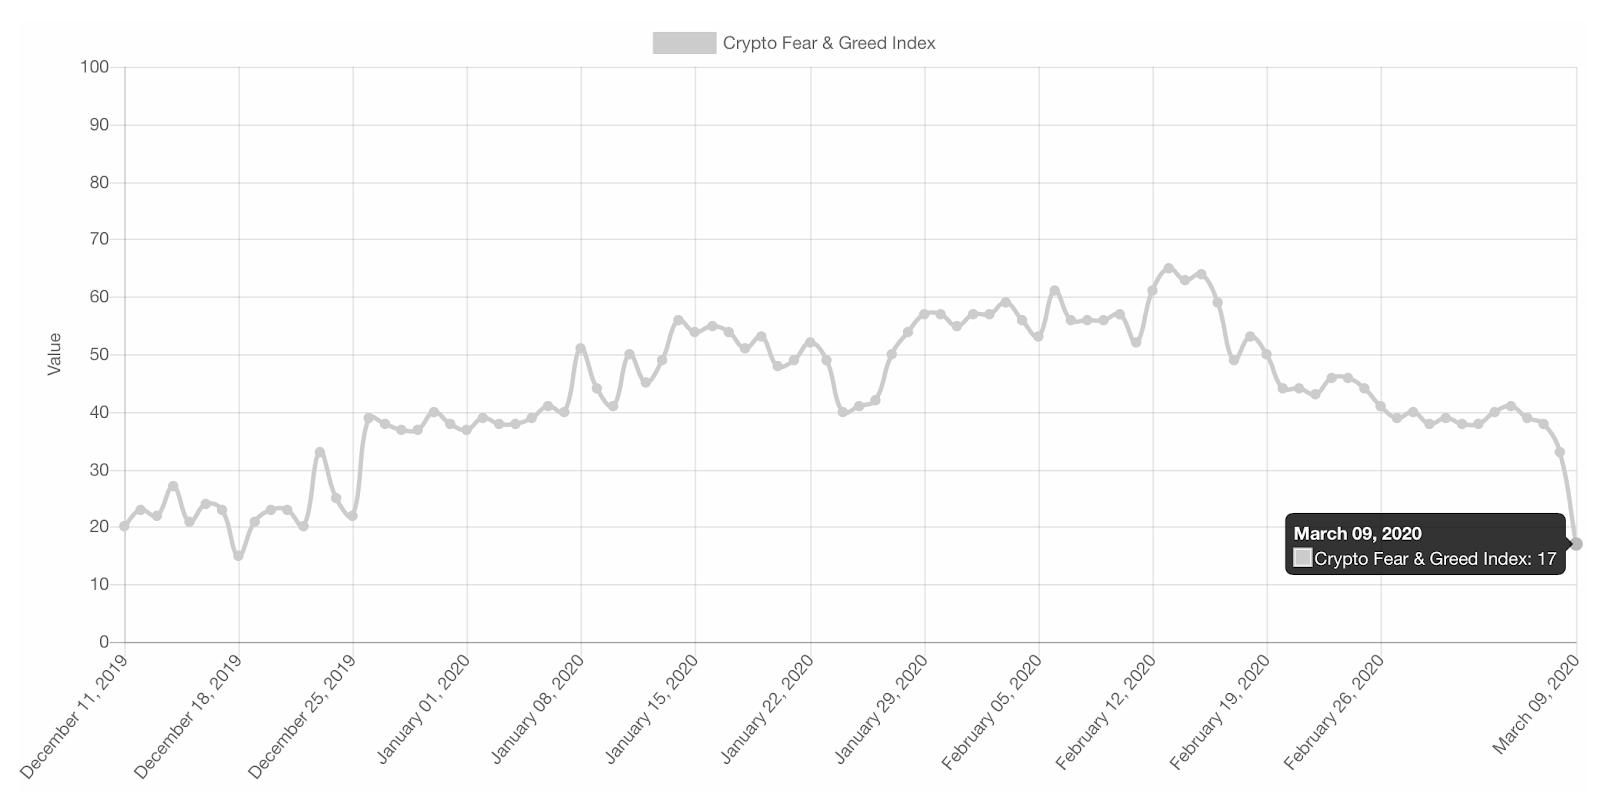 Bitcoin Drops Below 8000 As Markets Tumble Bitcoin Tumbling Financial Markets